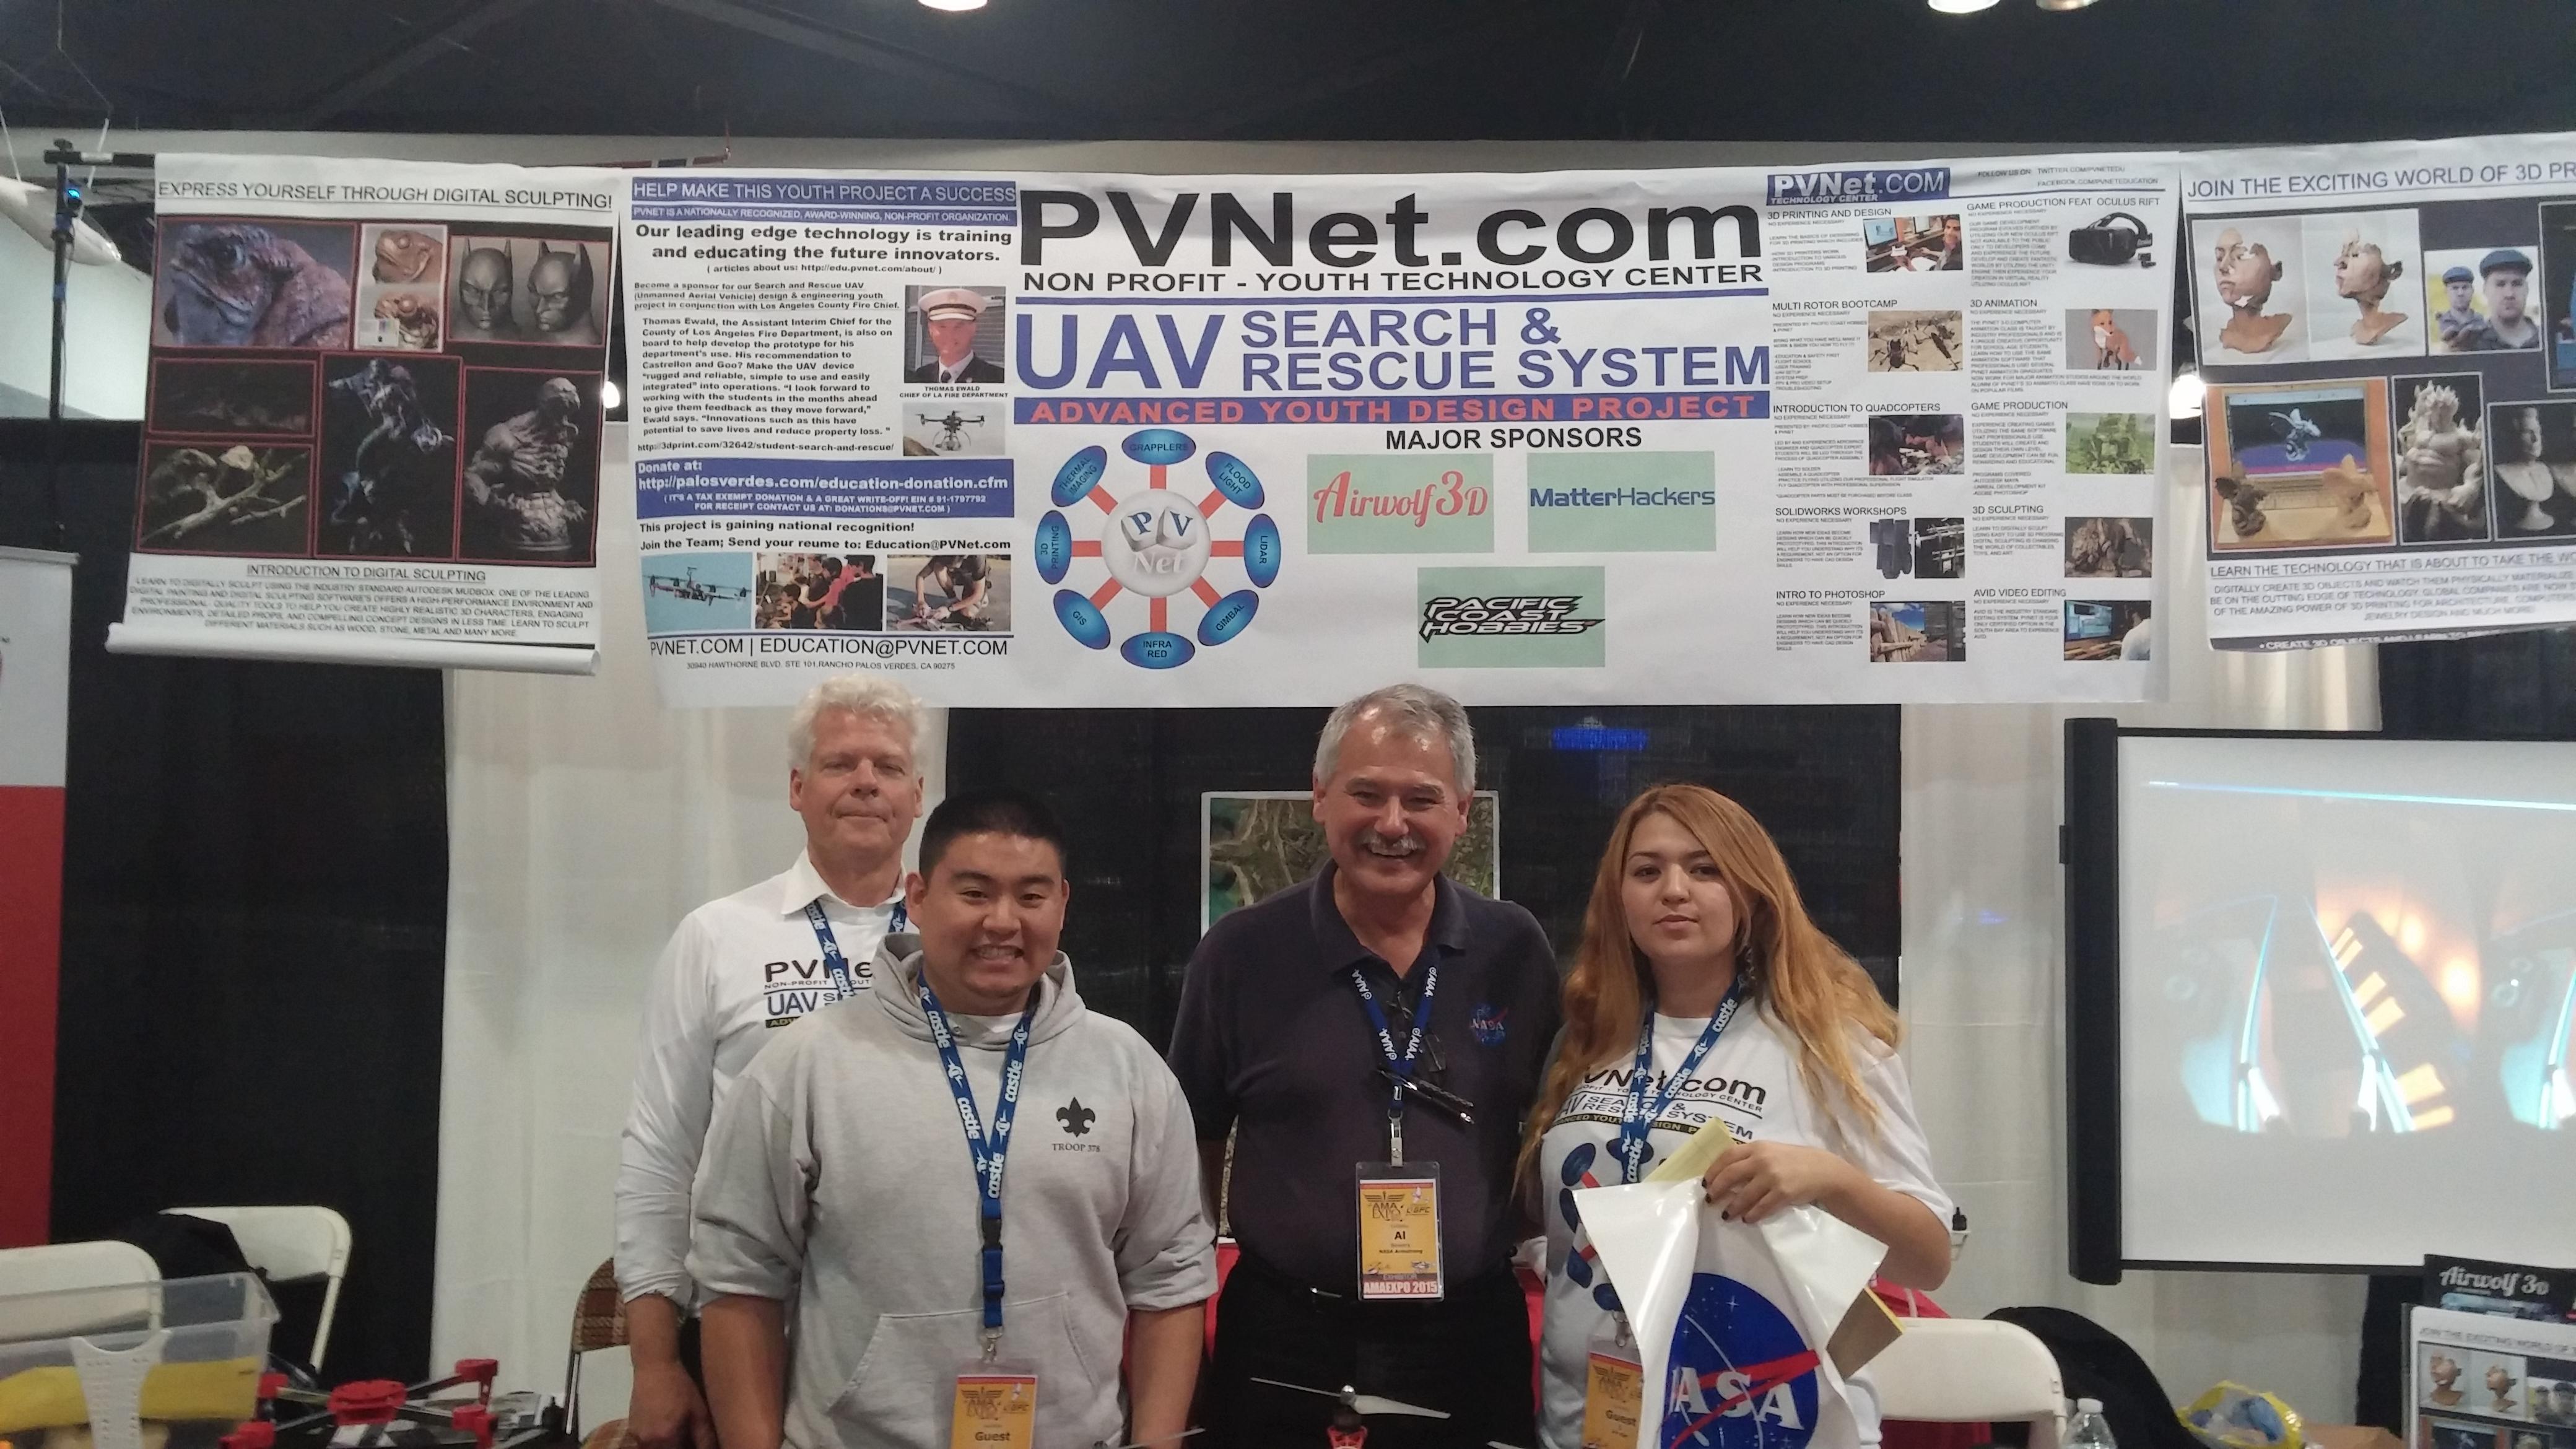 Palos Verdes on the Net: Interns: PVNet